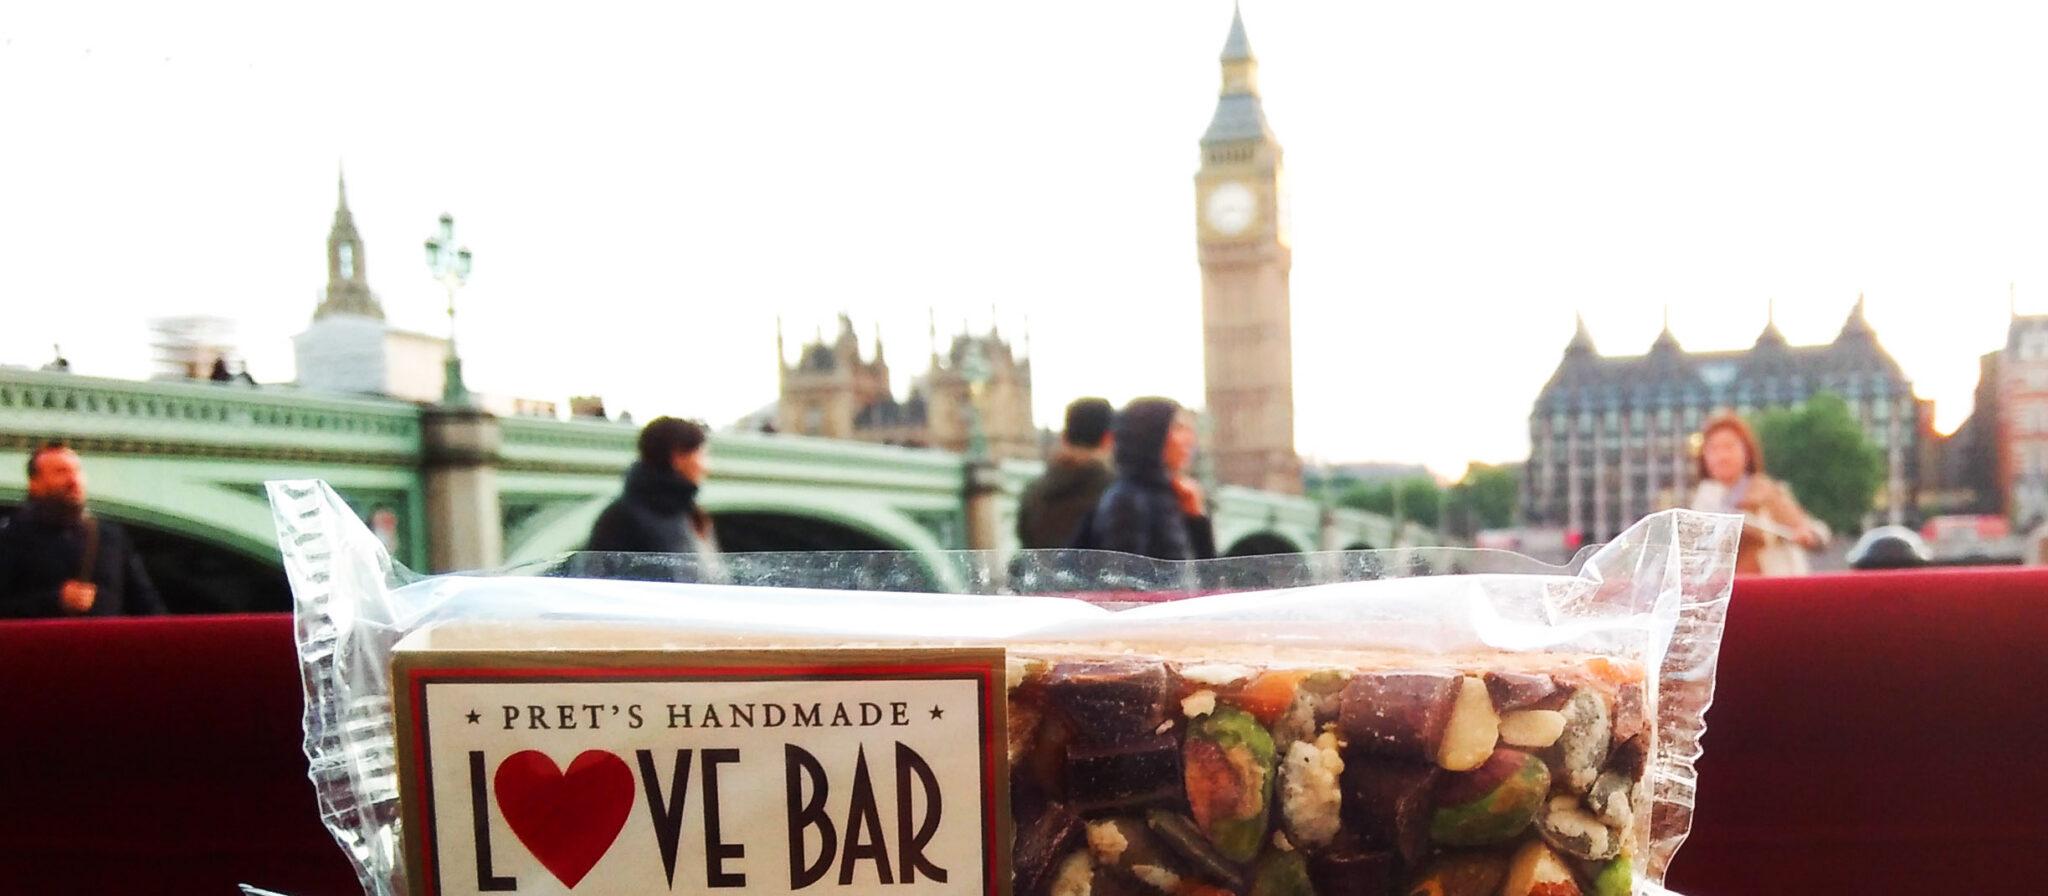 Seaman Memories. Love Bar in the city of Big Ben.